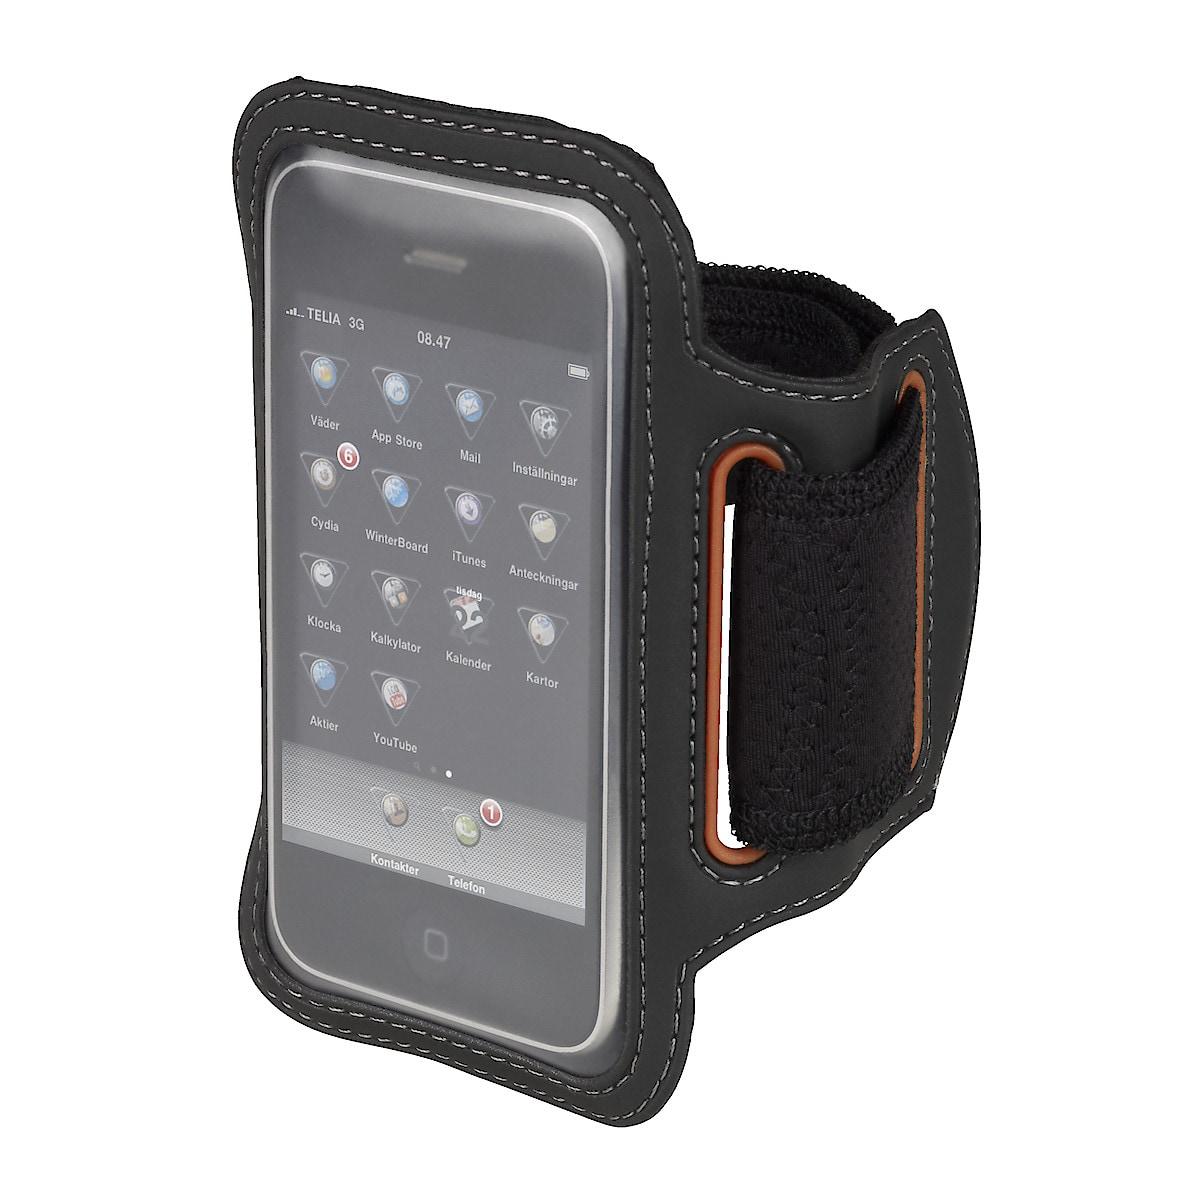 Armhållare för iPhone/iPod touch